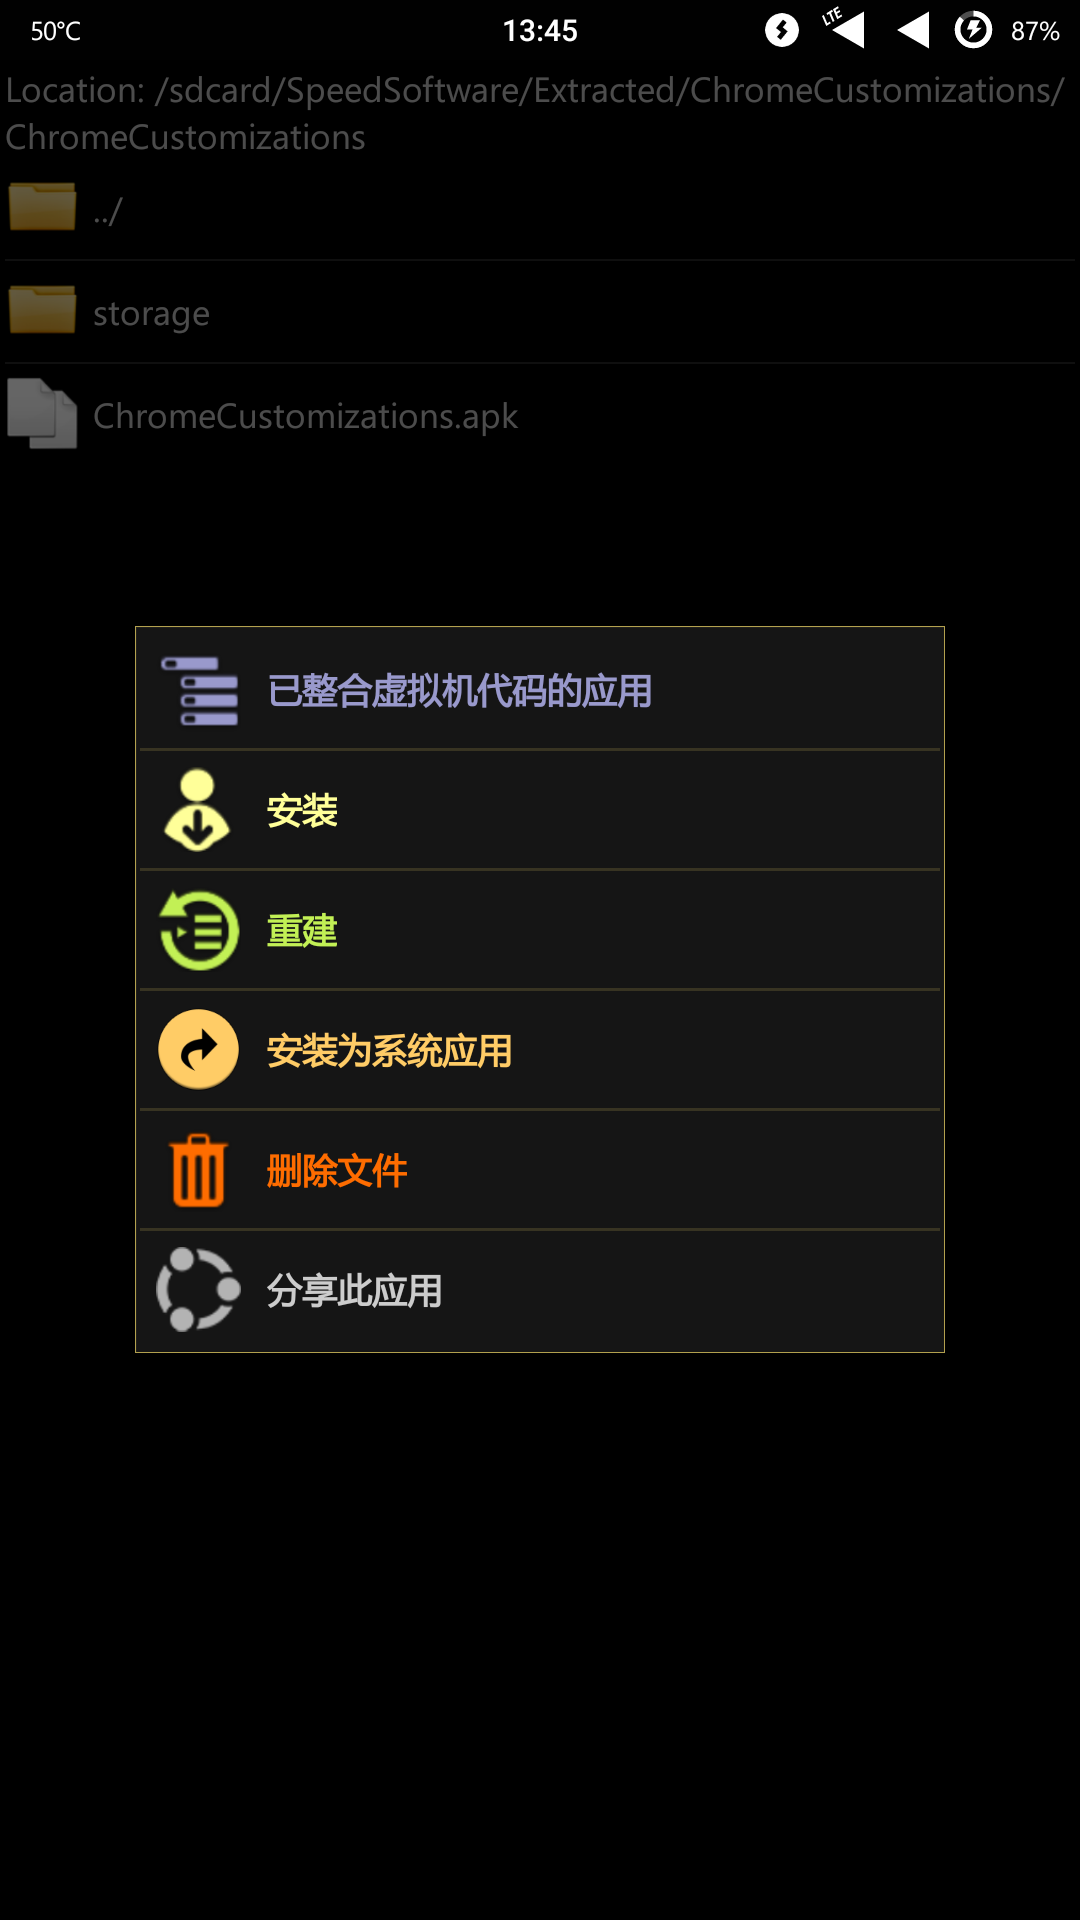 Screenshot_20160917-134517.png